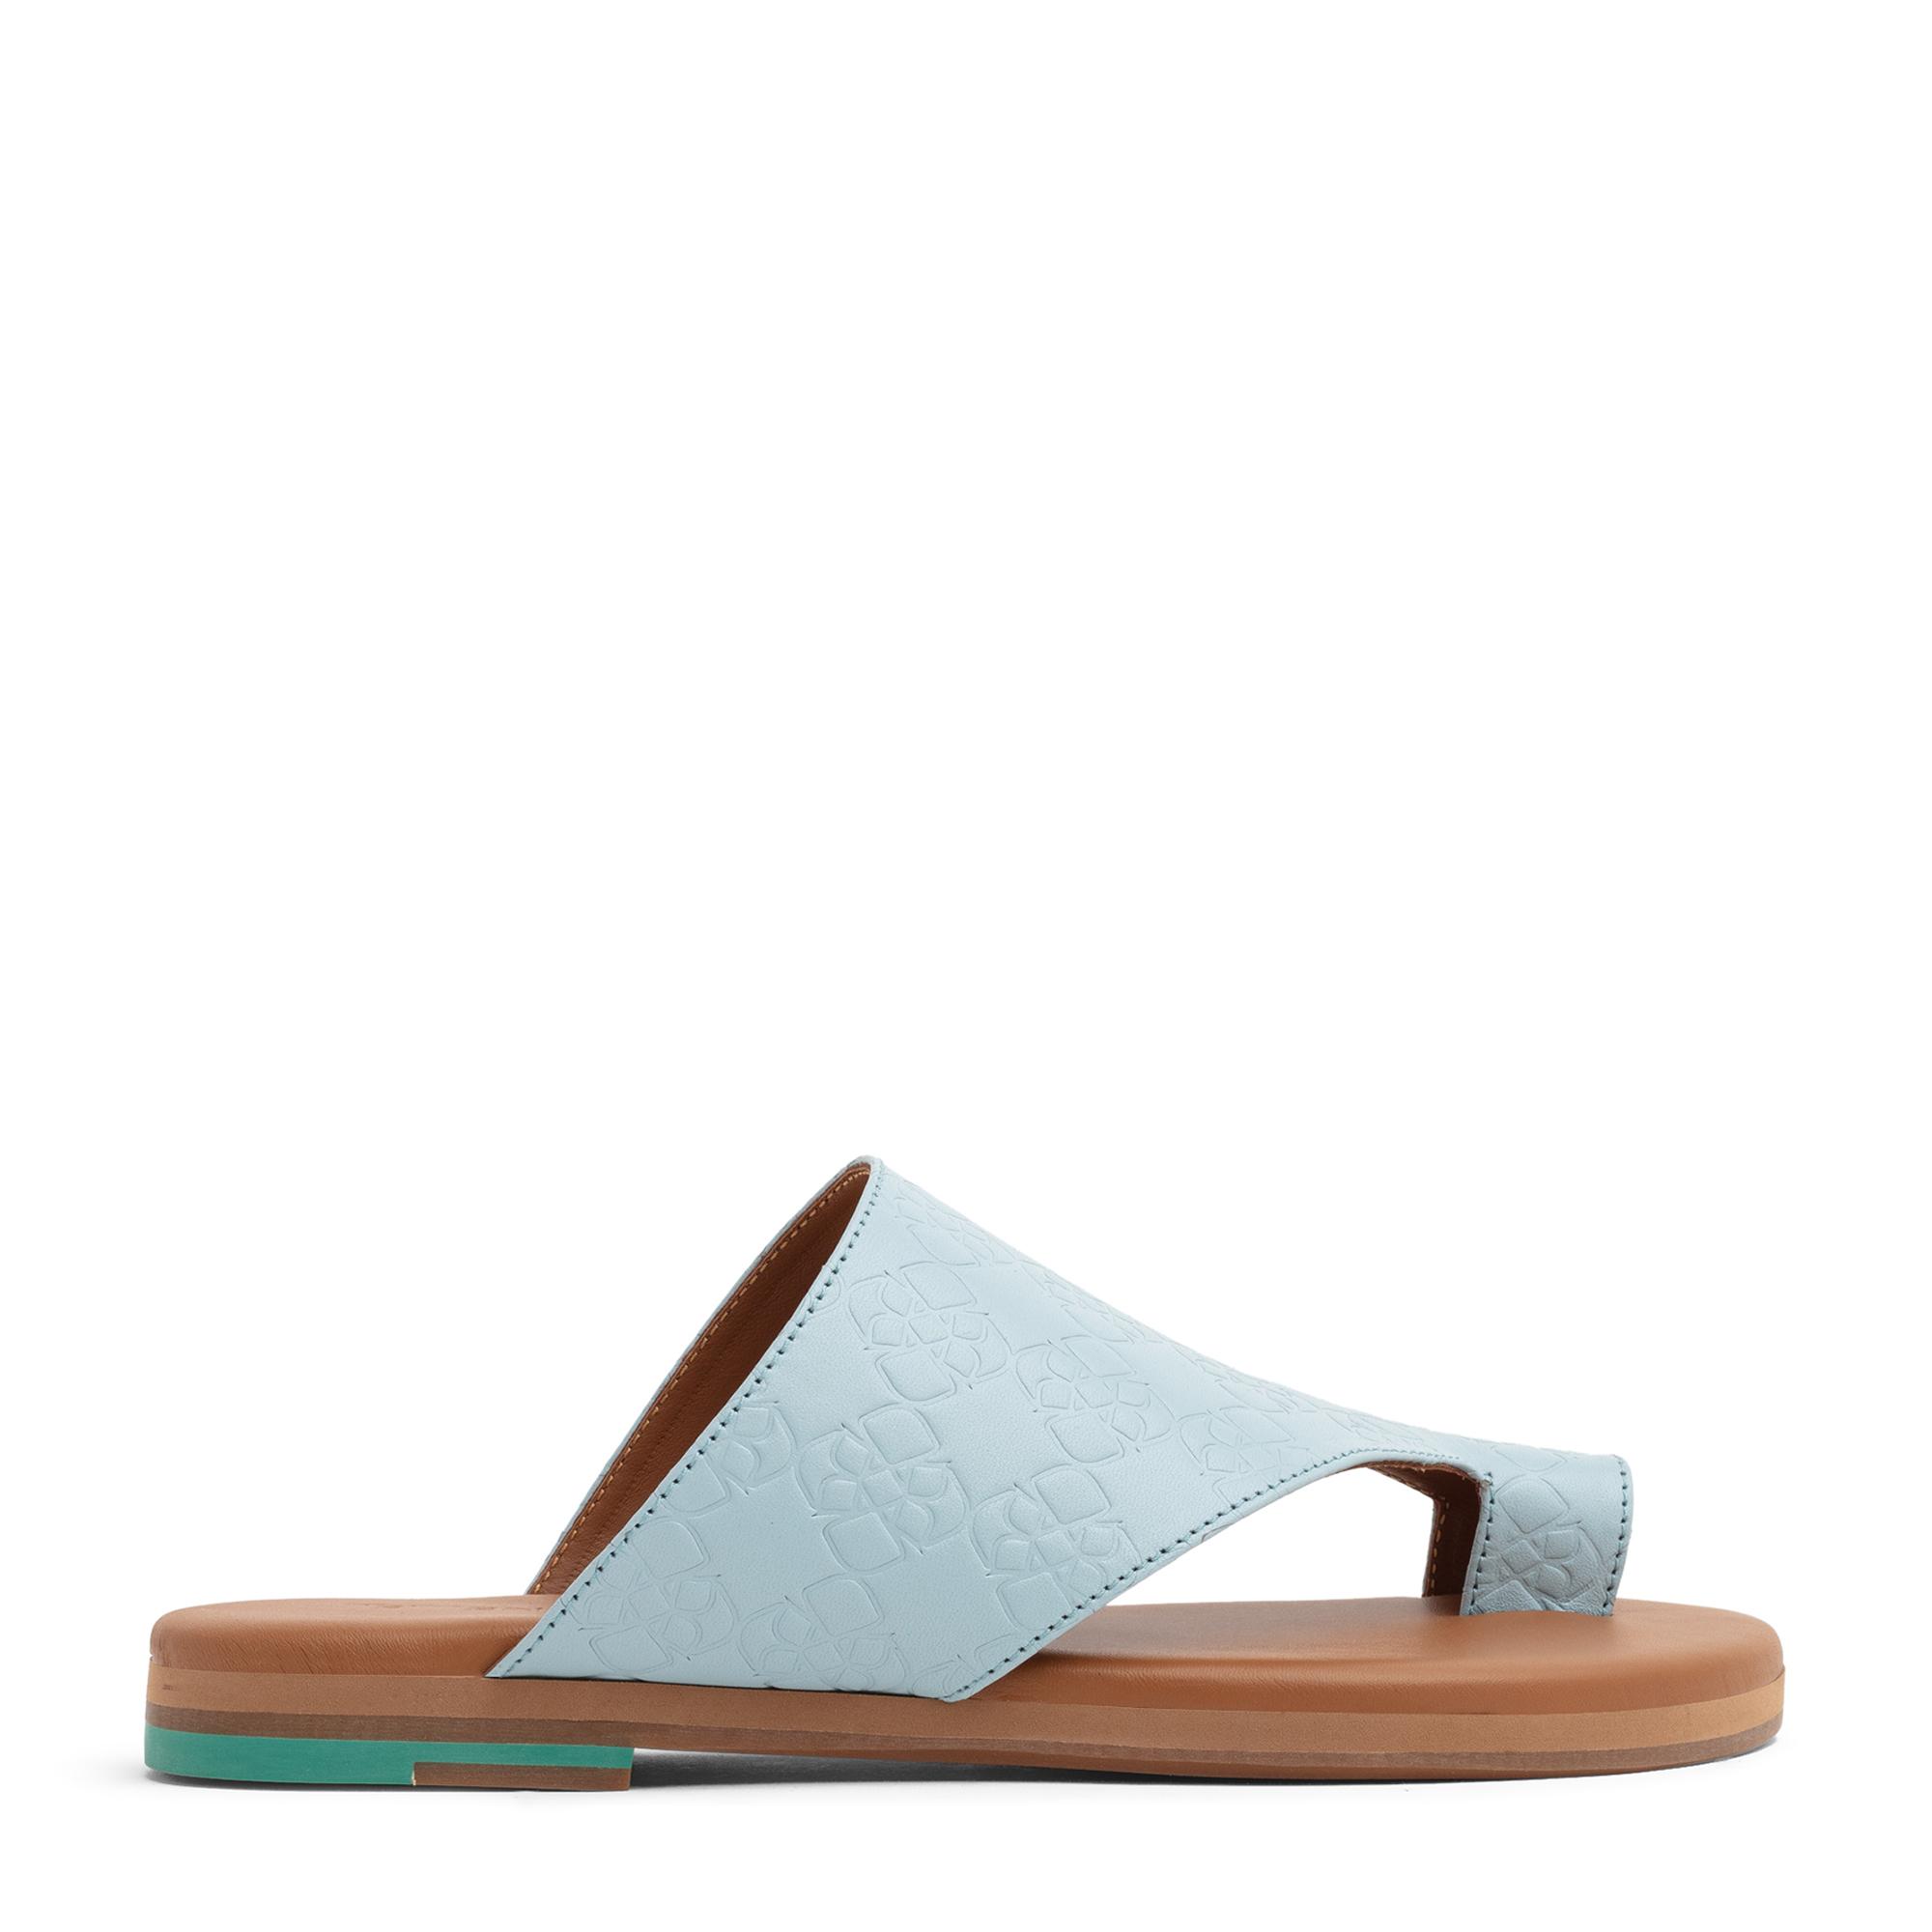 Sangbasy sandals